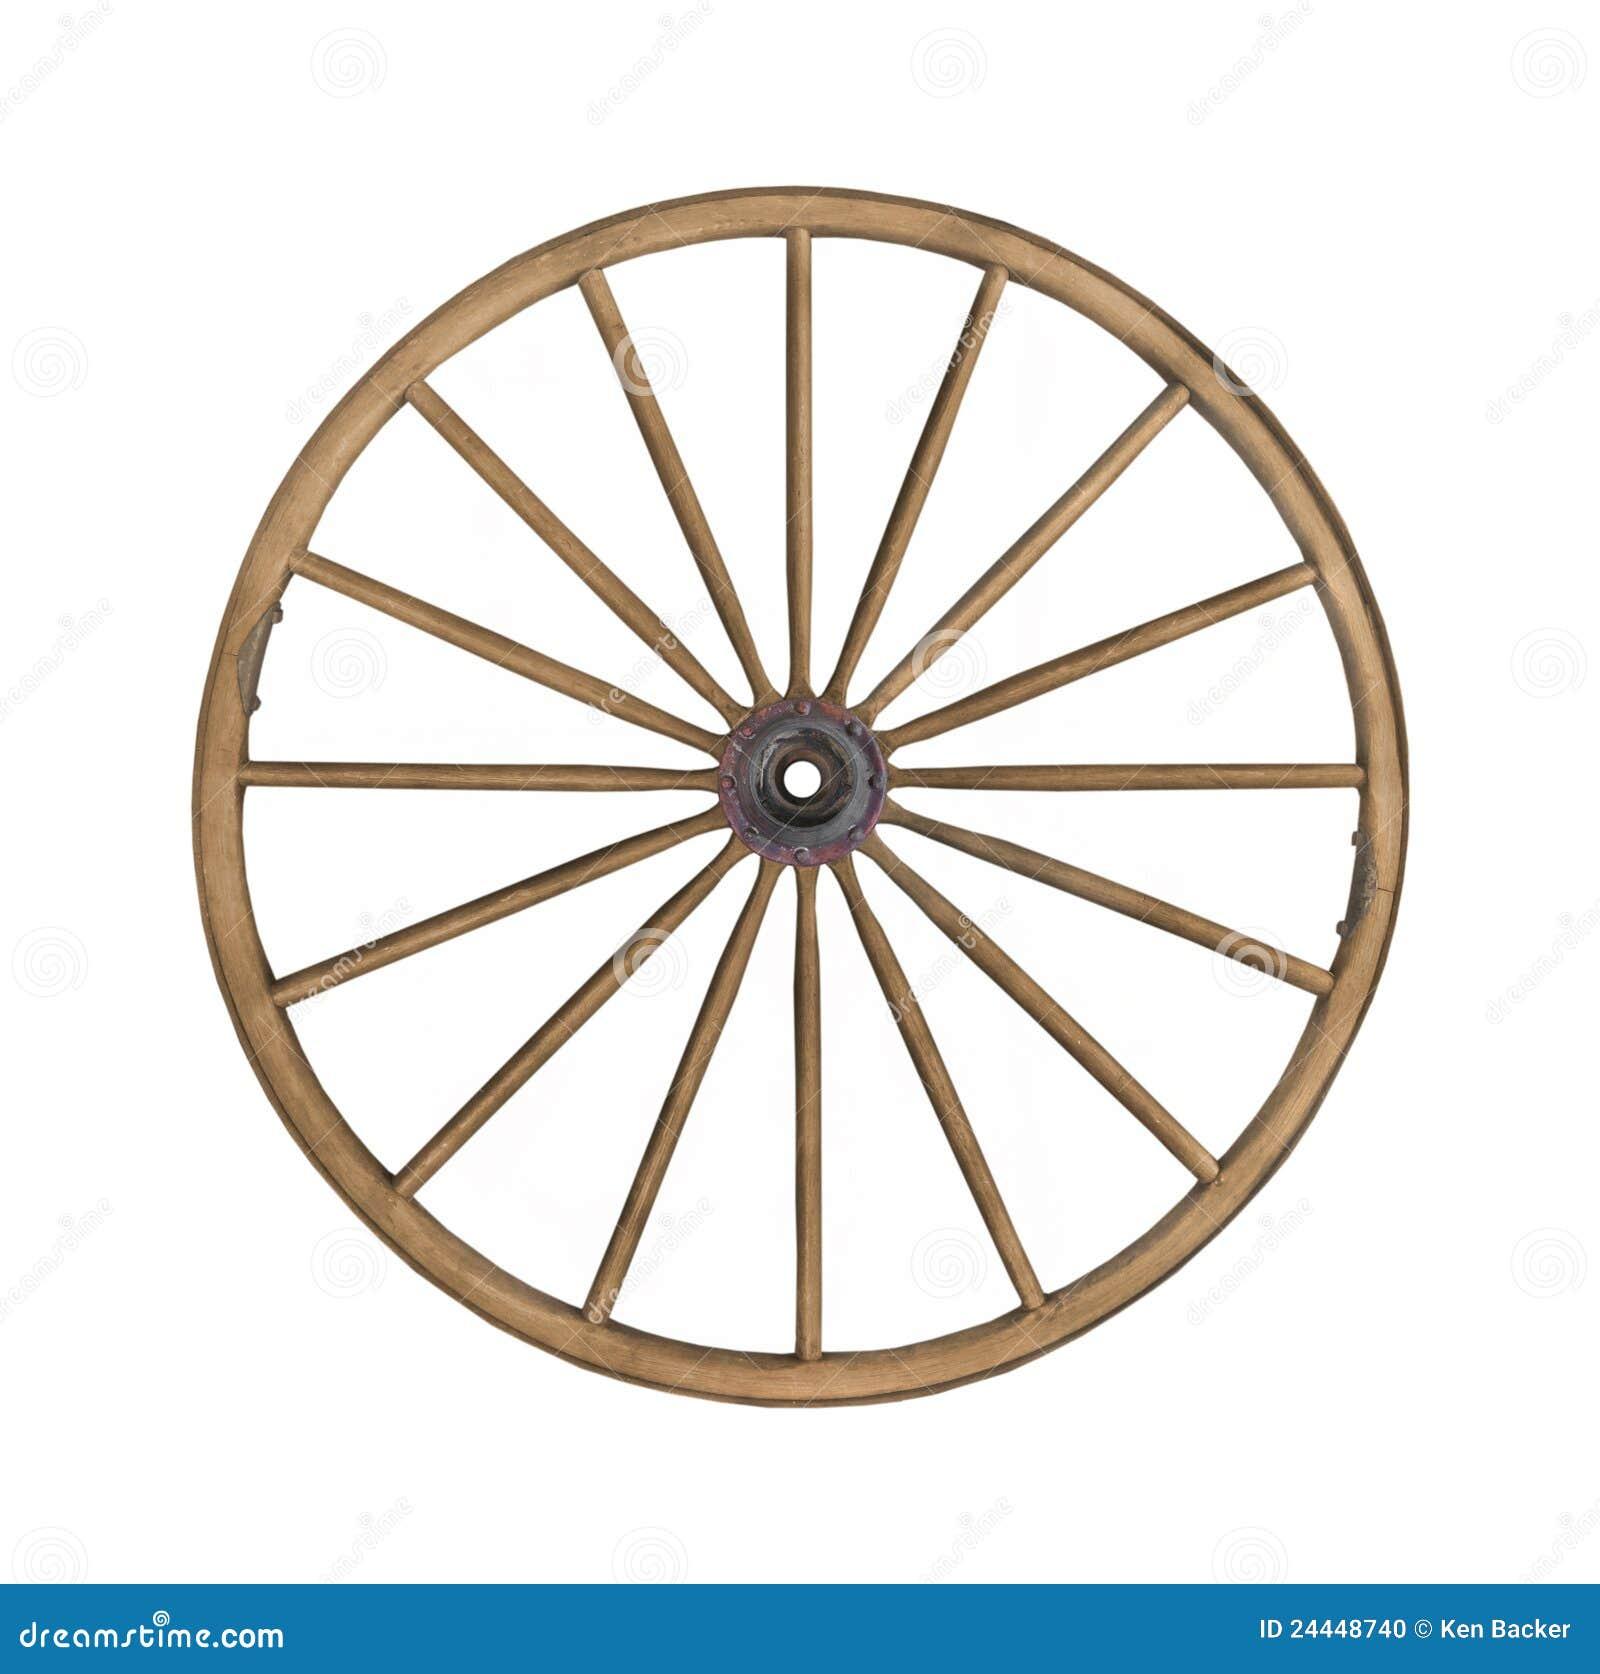 Vintage Wooden Wagon Wheel Isolated Stock Photo Image